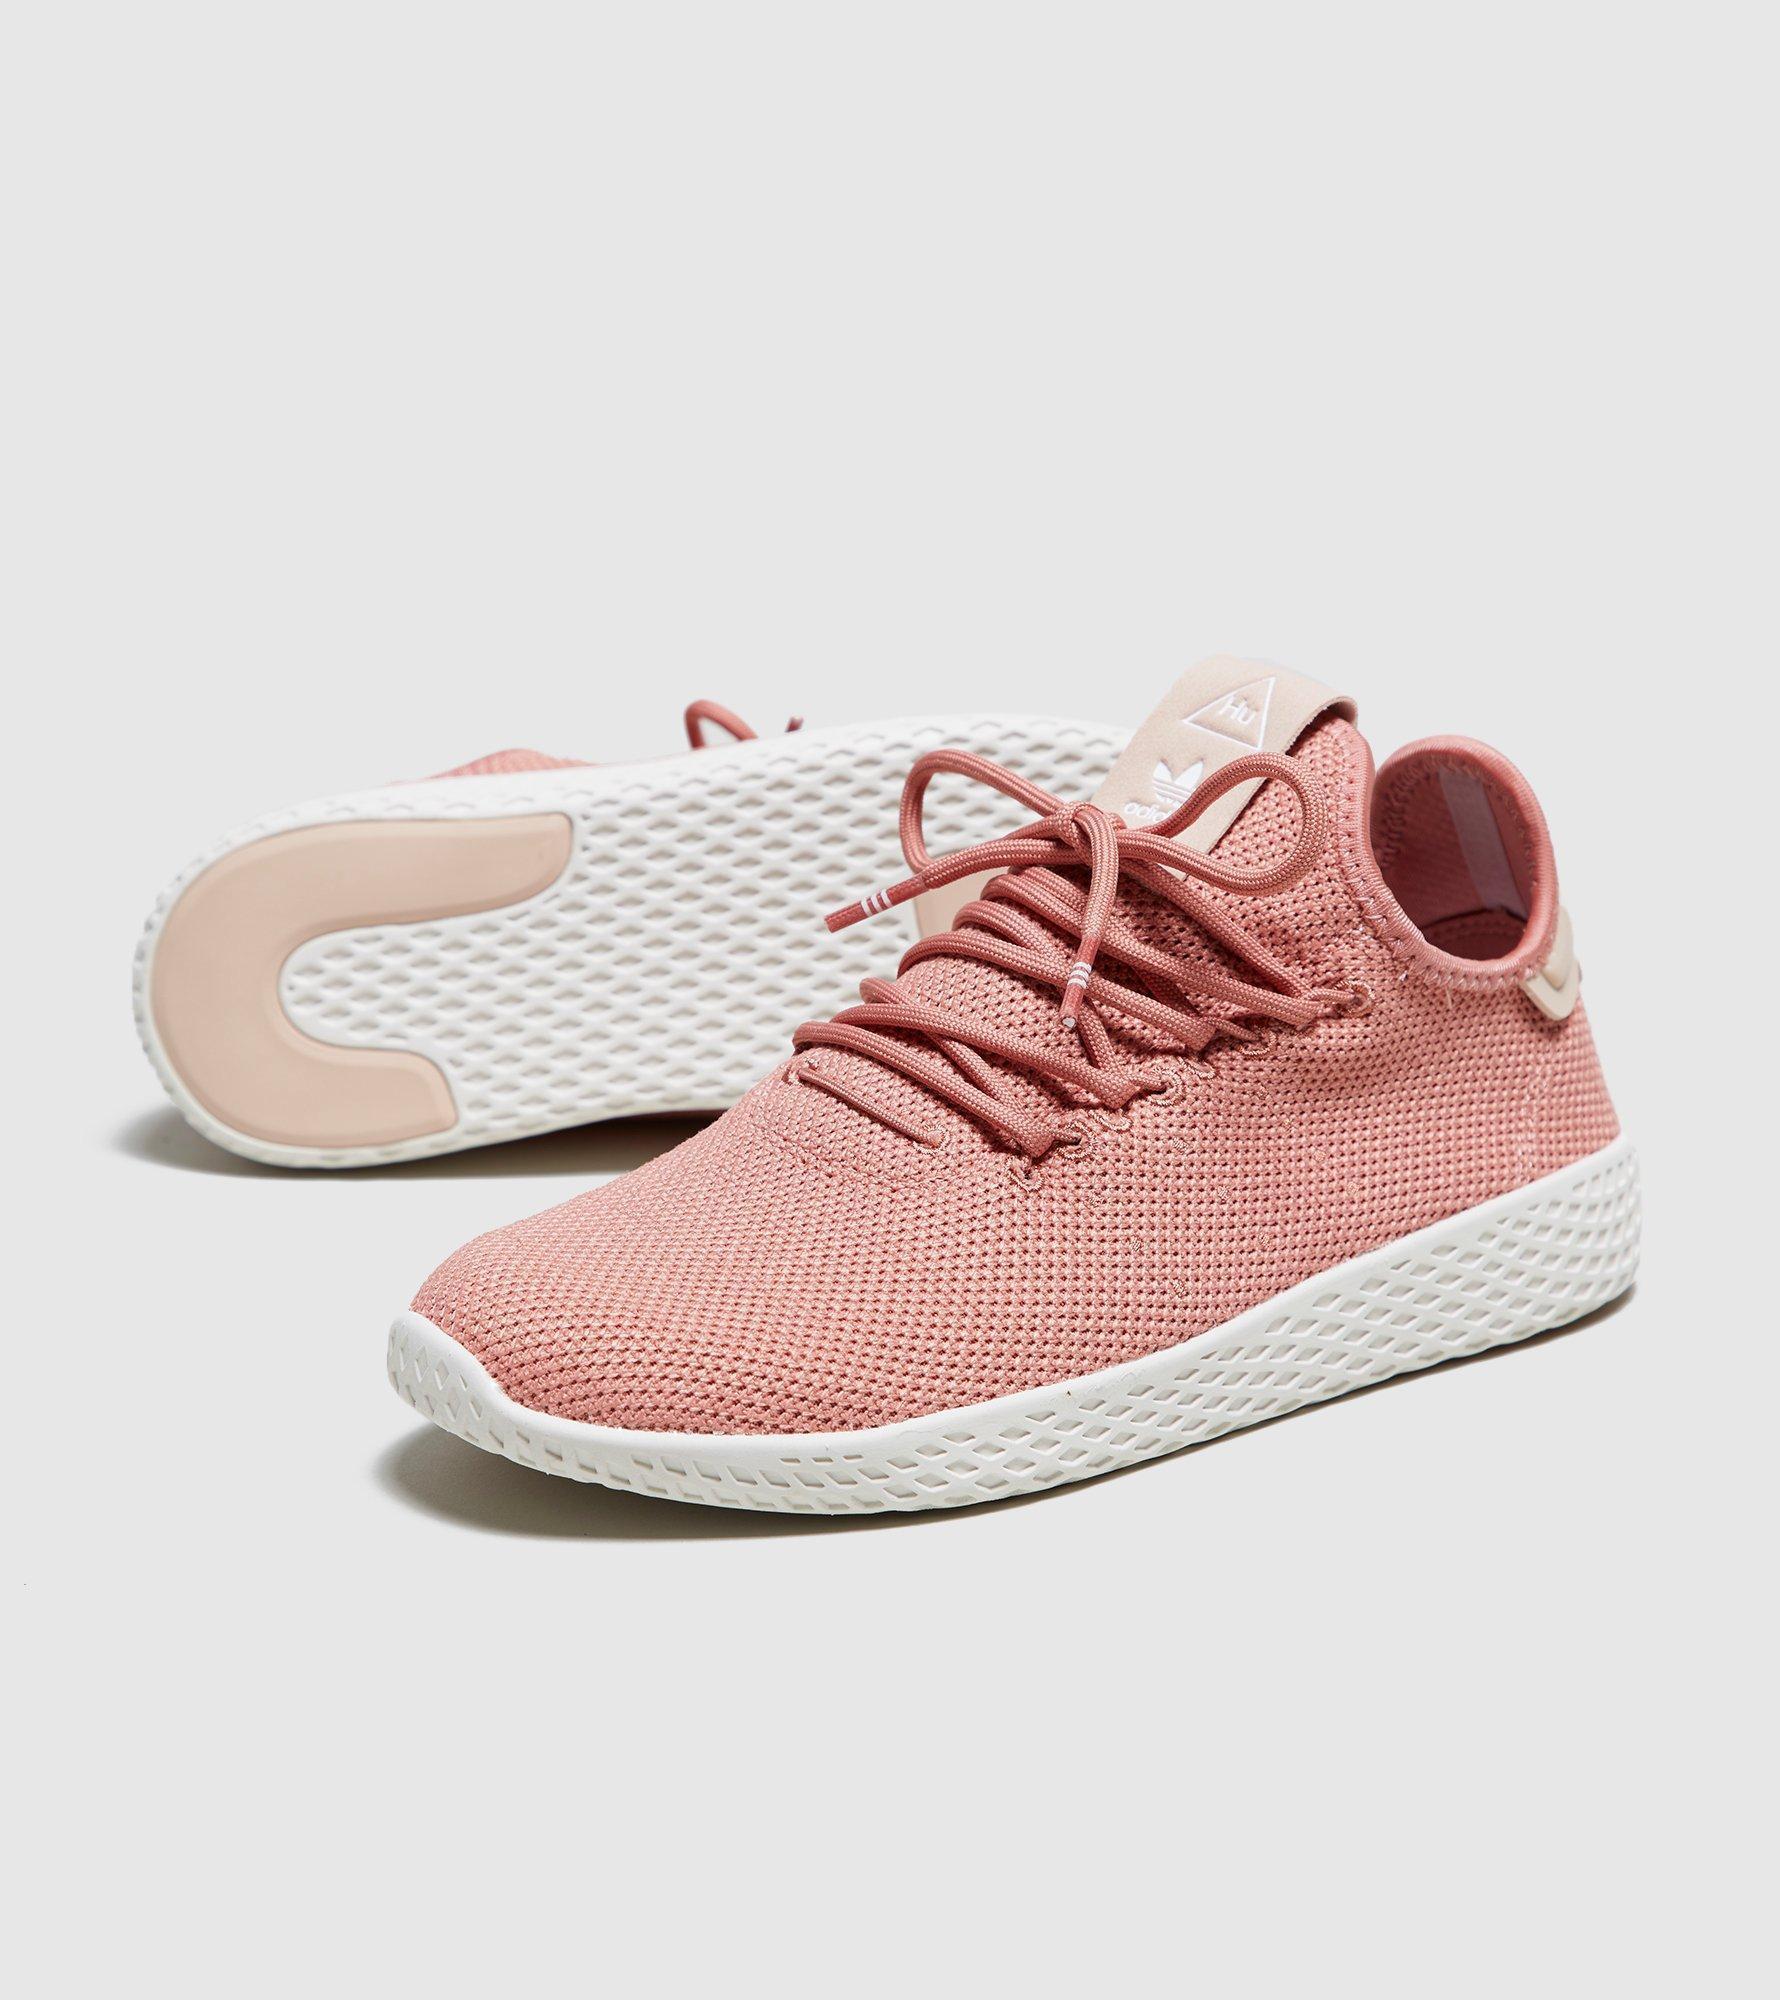 f74eda070 adidas Originals Pharrell Williams Tennis Hu Trainers in Pink - Lyst